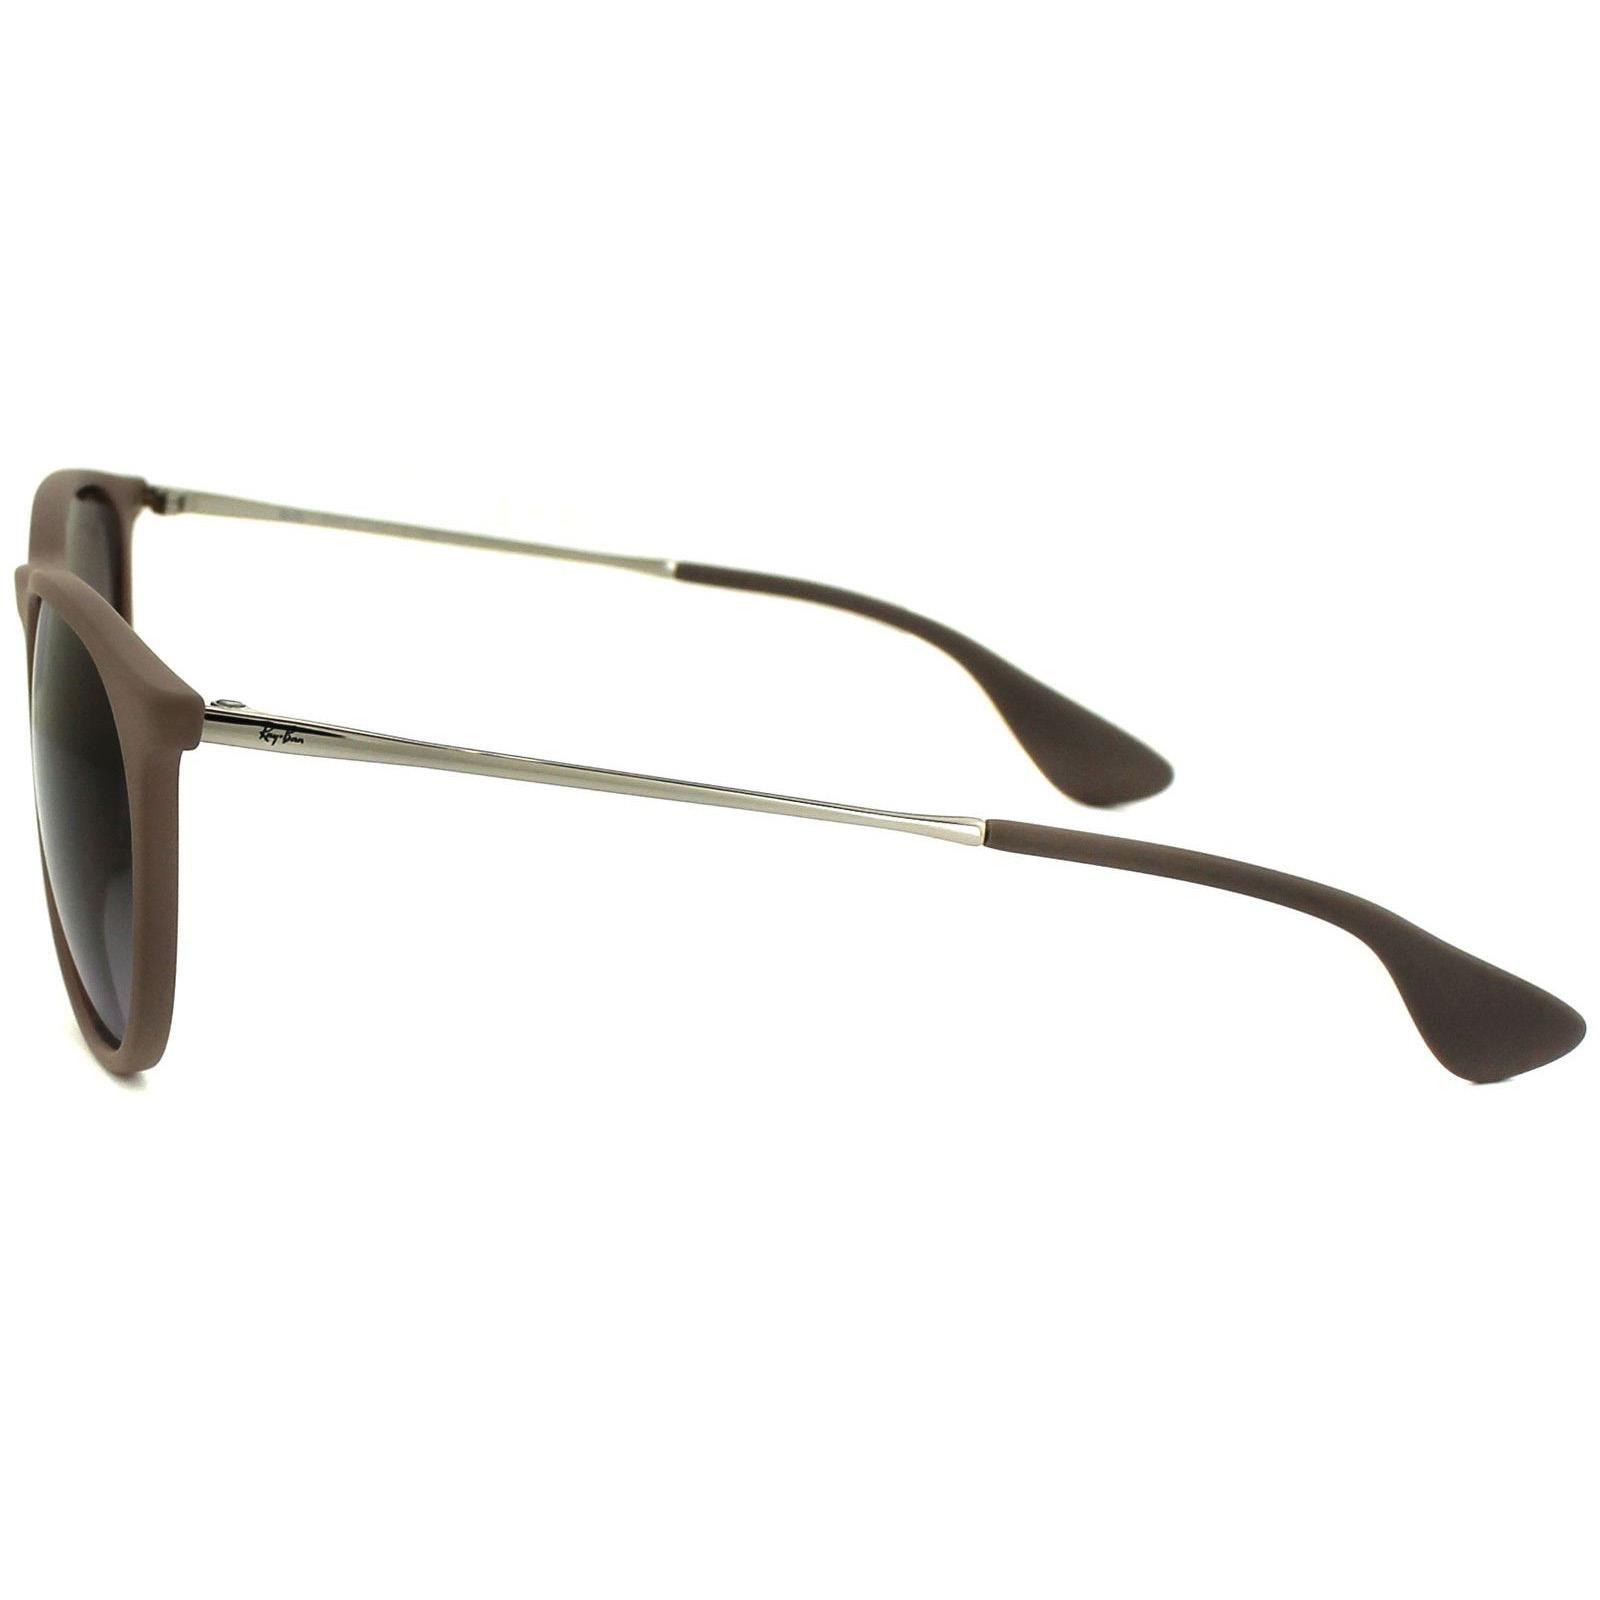 Ray-Ban Sunglasses Erika 4171 600068 Dark Rubber Sand Brown Gradient